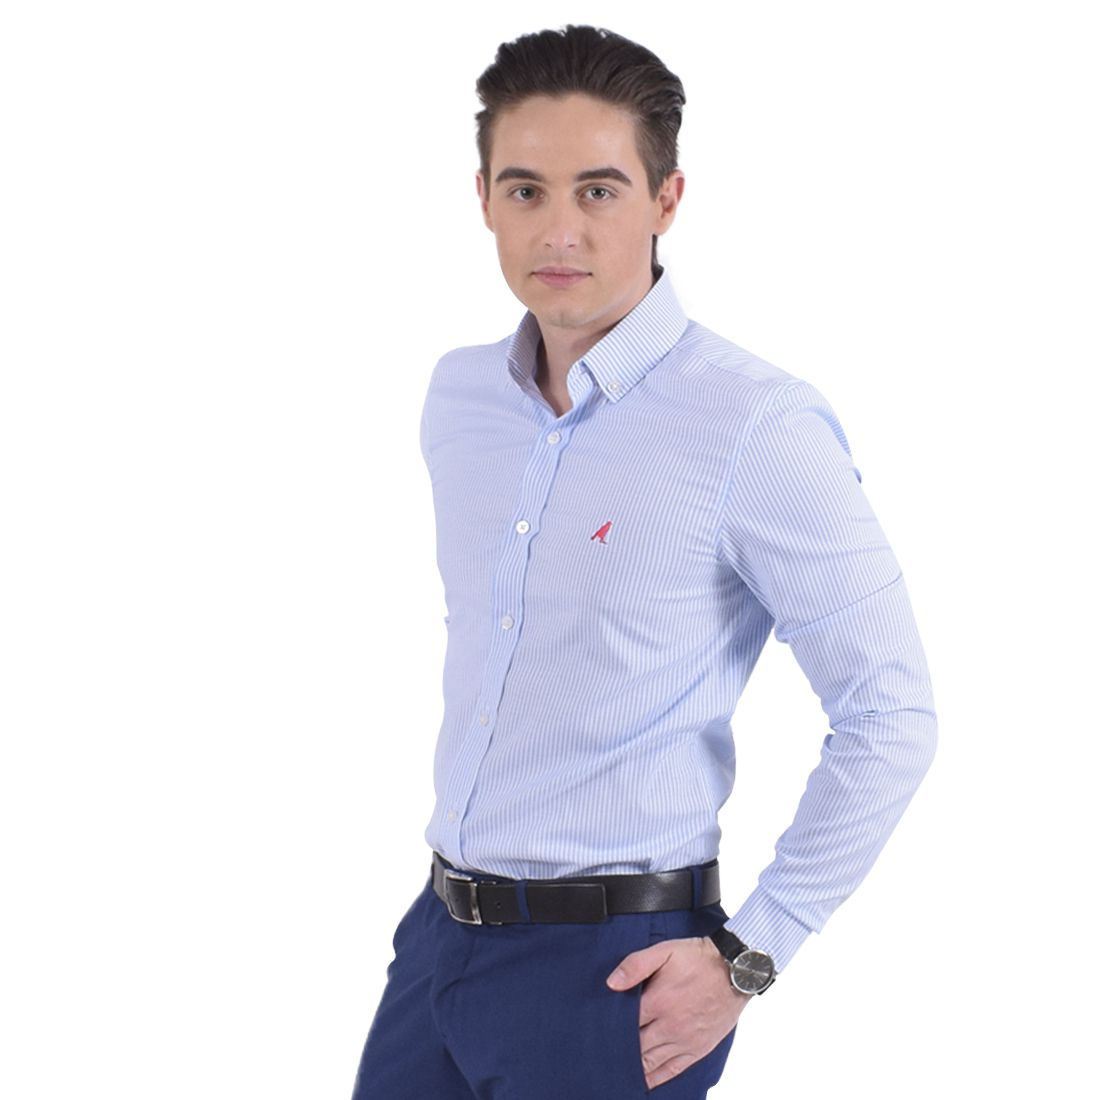 100210 - Camisa Social Masculina Slim Listra Azul - LEVOK